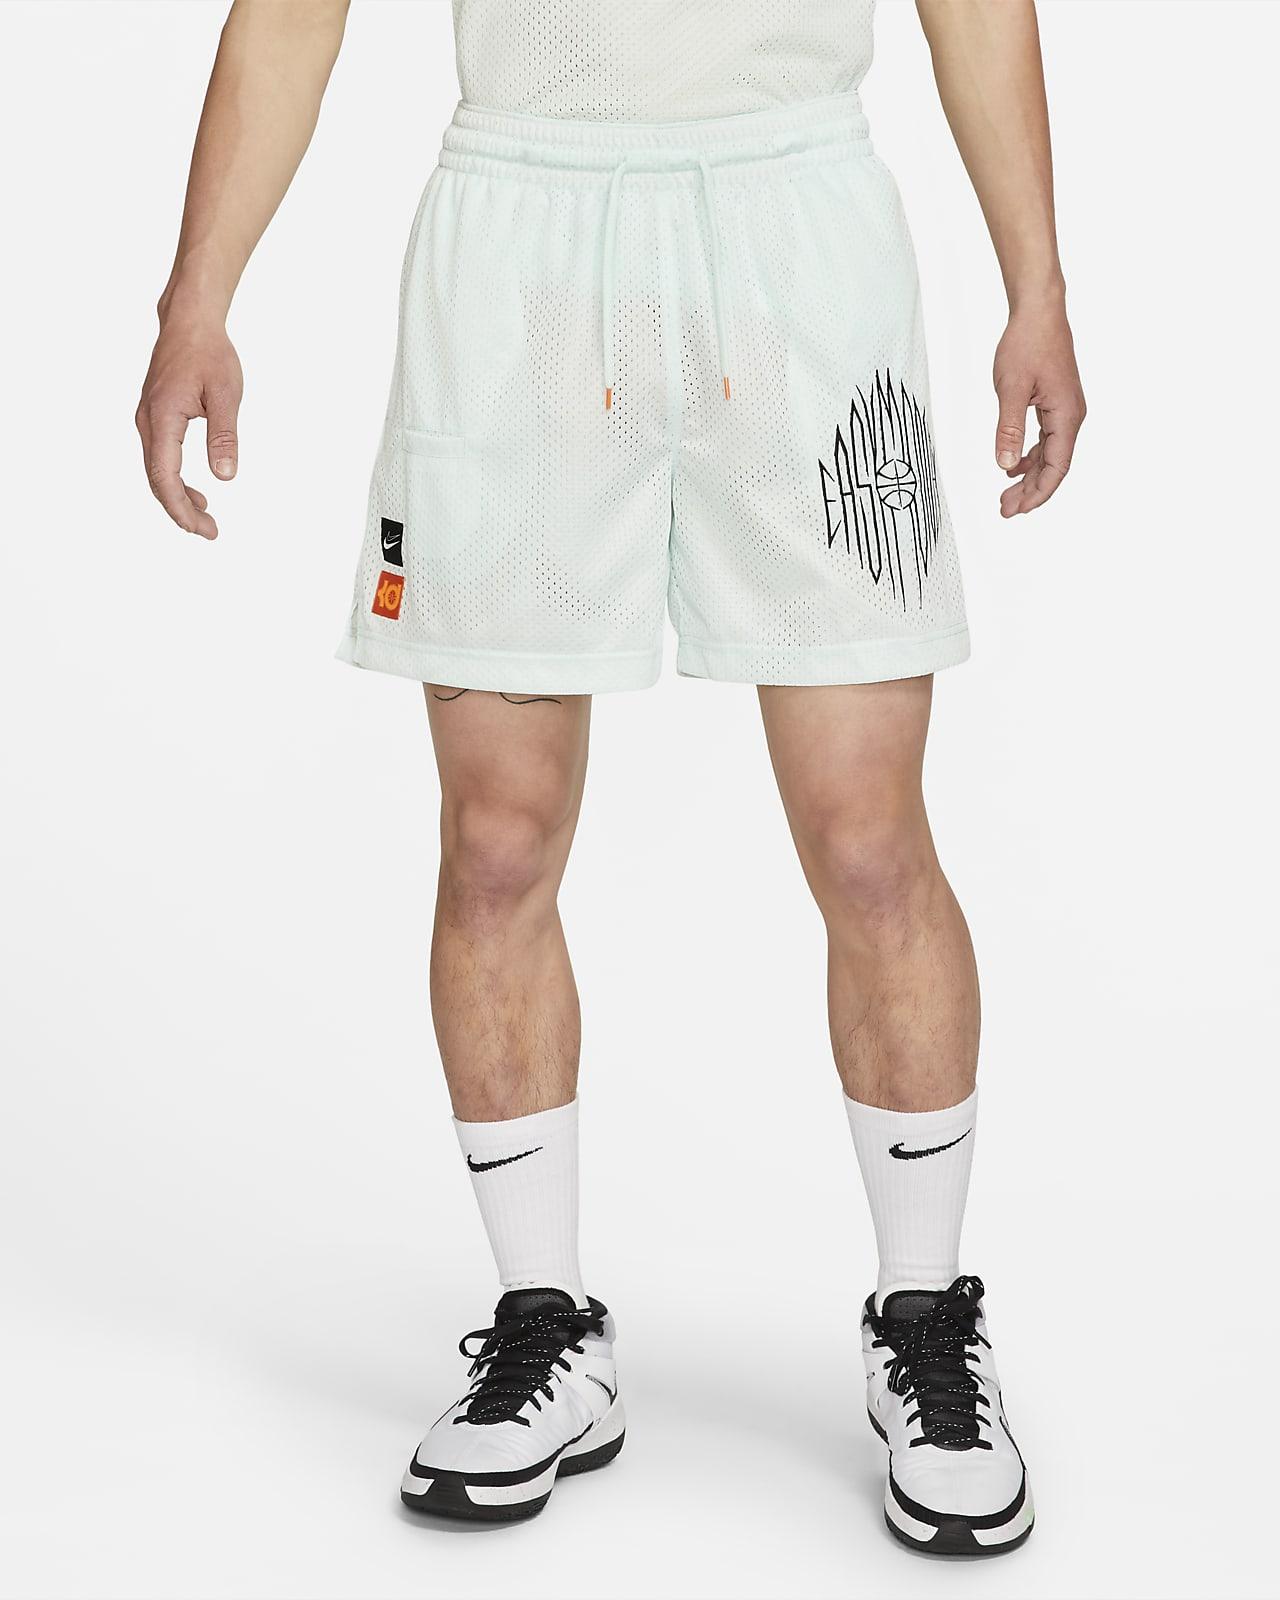 KD 男款籃球褲